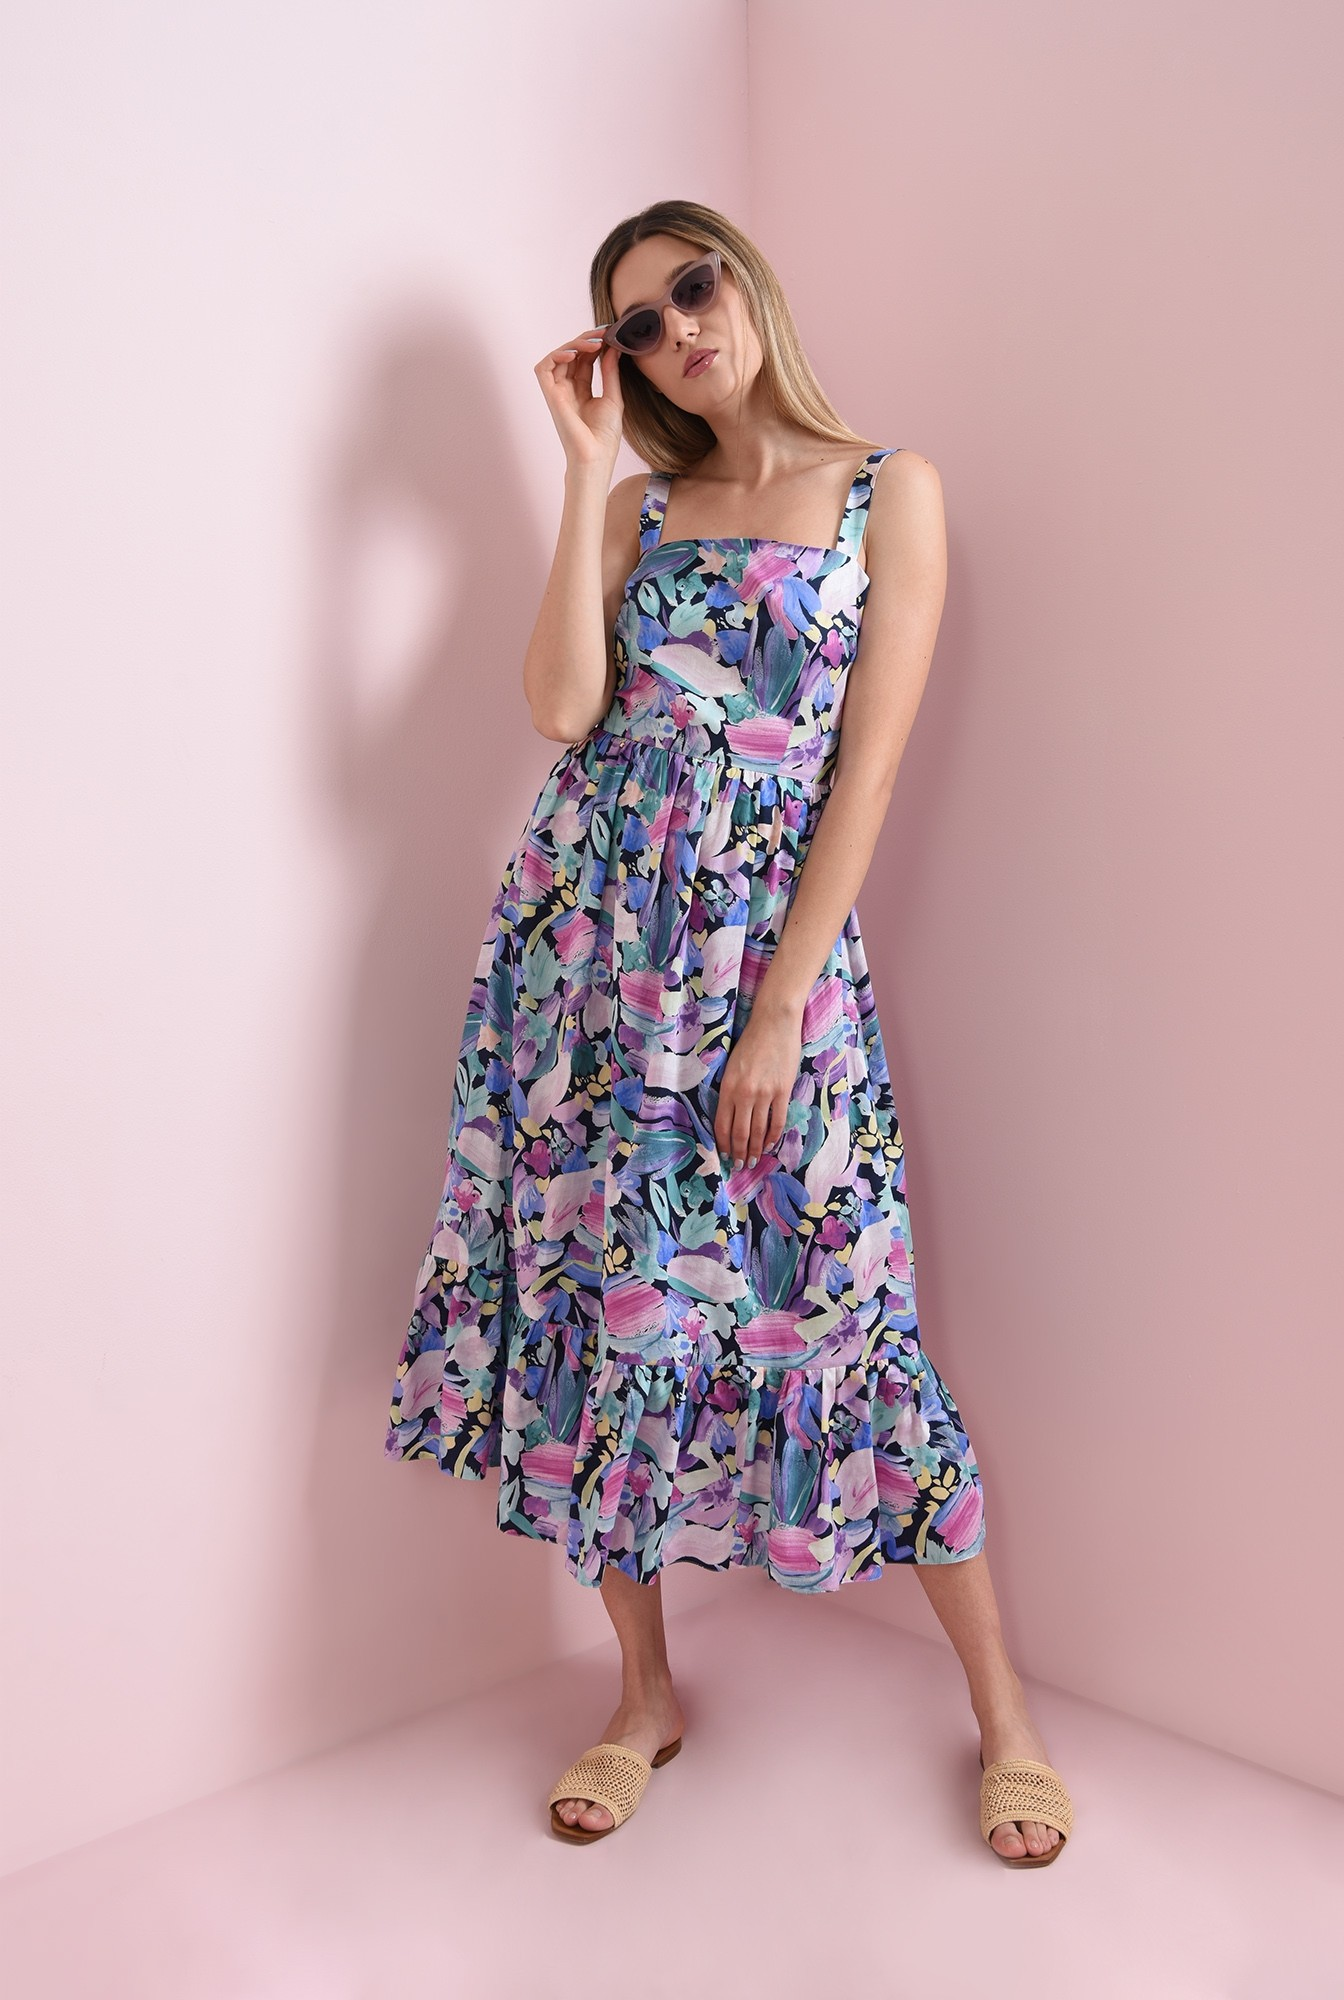 0 - rochie cu imprimeu multicolor, cu bretele